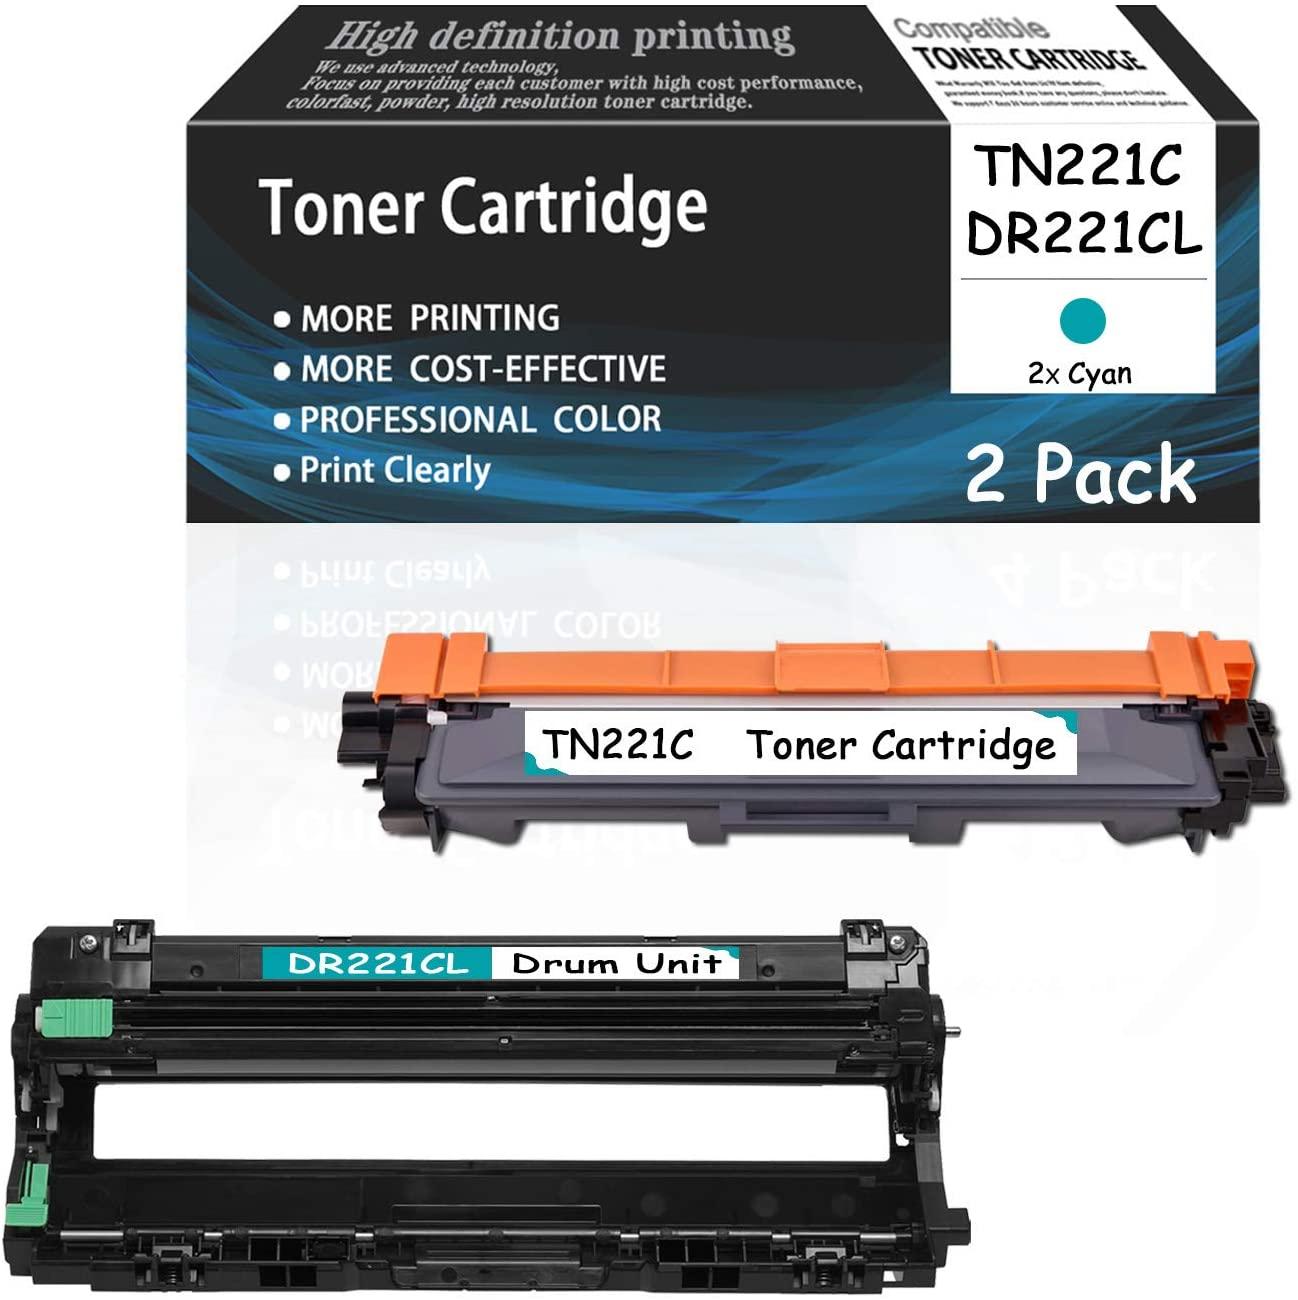 (2 Pack,Cyan) DR221CL Drum Unitand TN221C Toner Cartridge CompatibleforBrother HL-3140CW 3150CDN 3170CDW MFC-9130CW 9140CDN 9330CDW 9340CDW DCP-9015CDW Printers,Sold by AcToner.